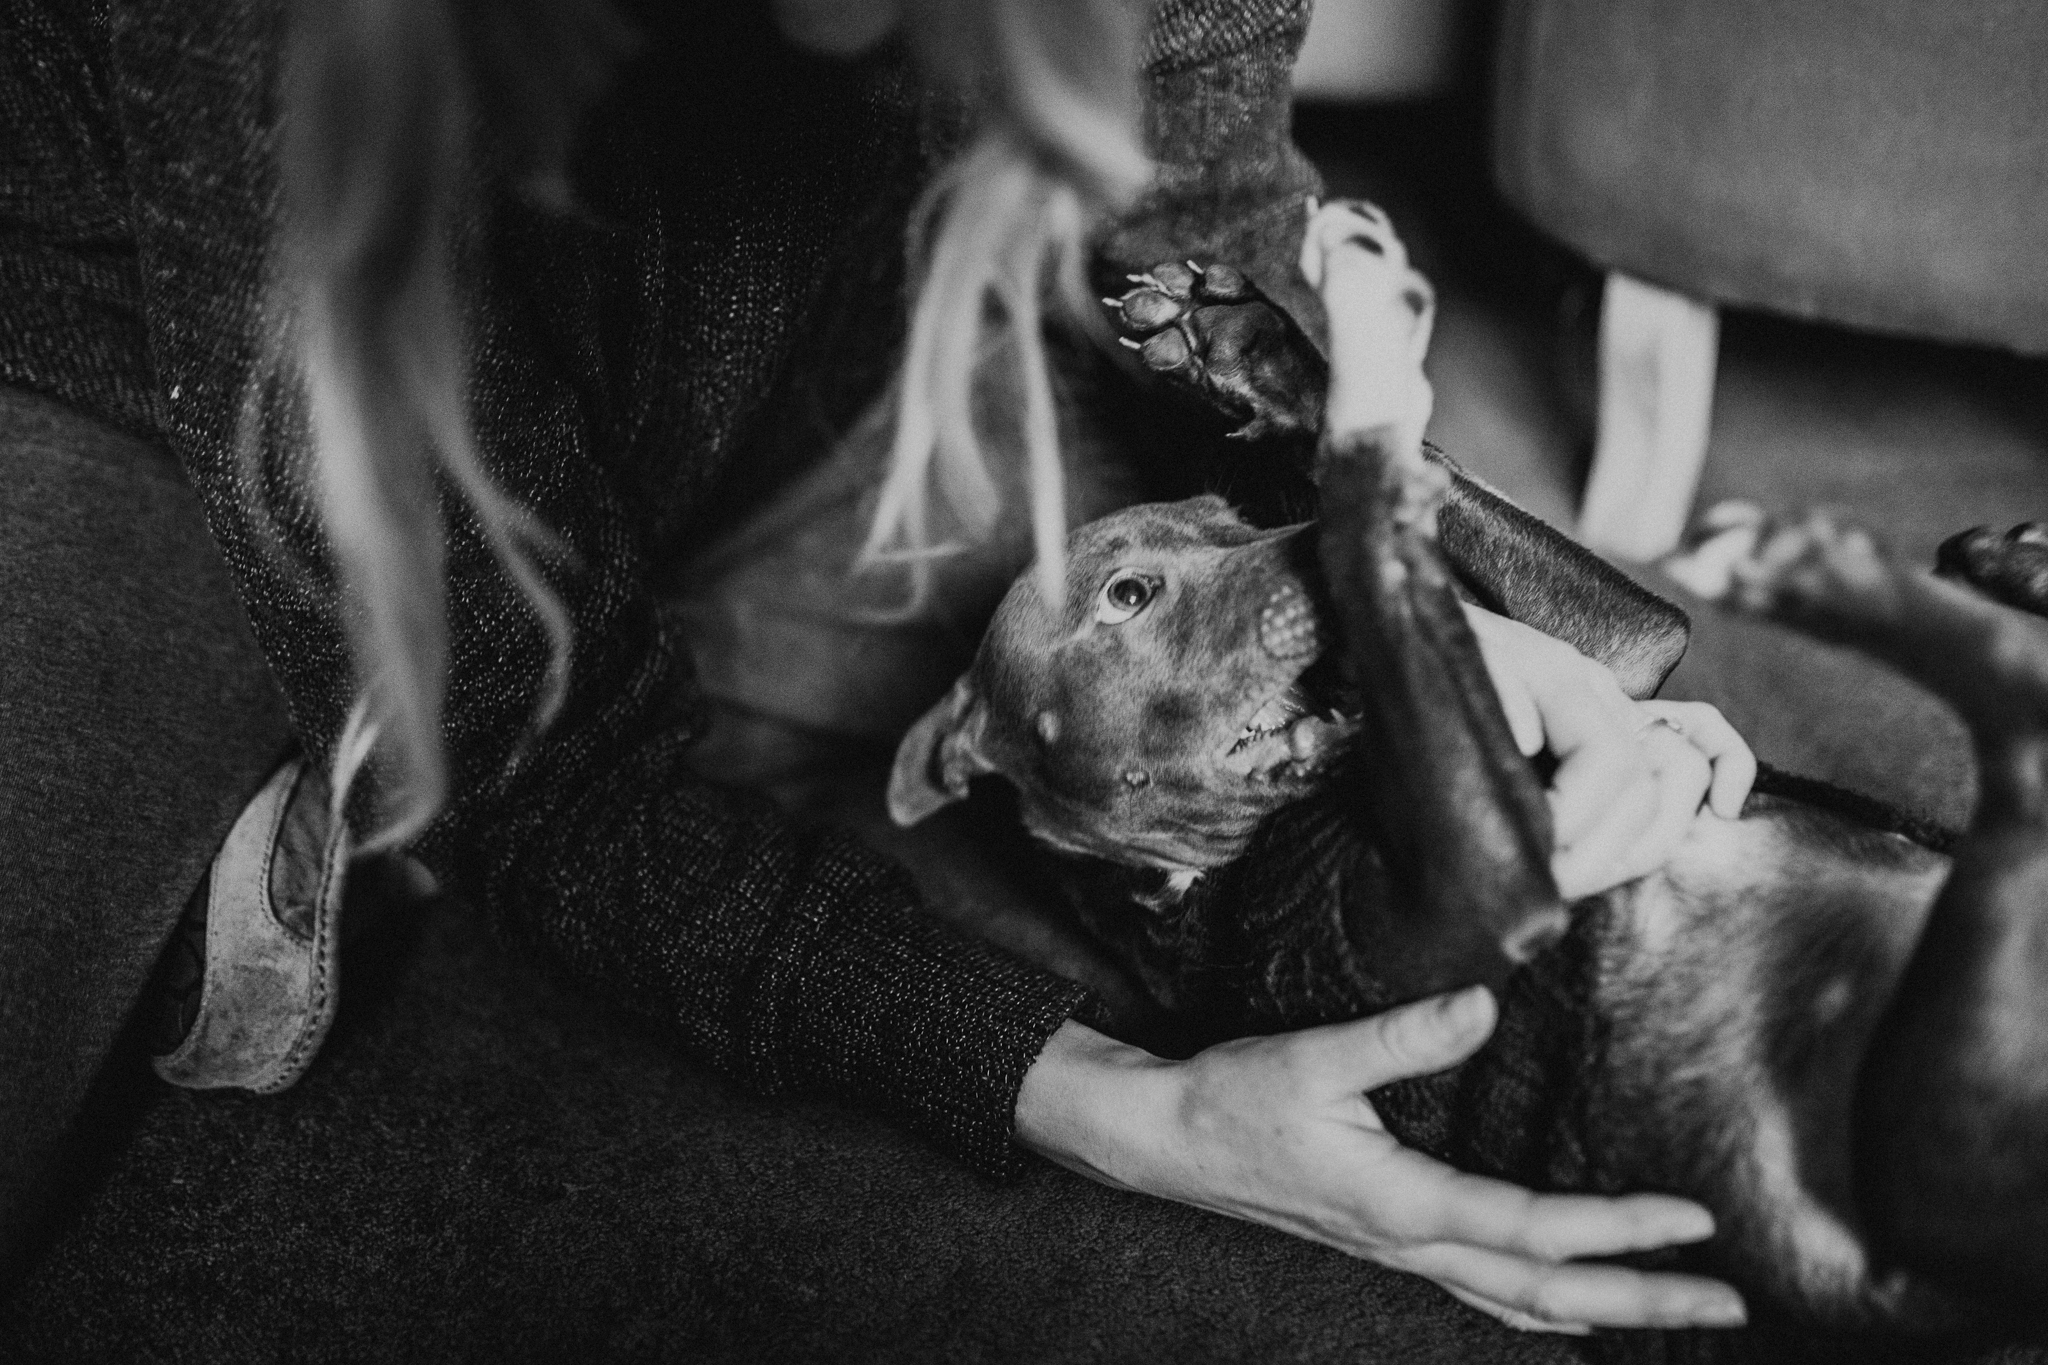 Dog-Human-Session-Photography-Darina-Stoda-Animal-Indigo-9.jpg